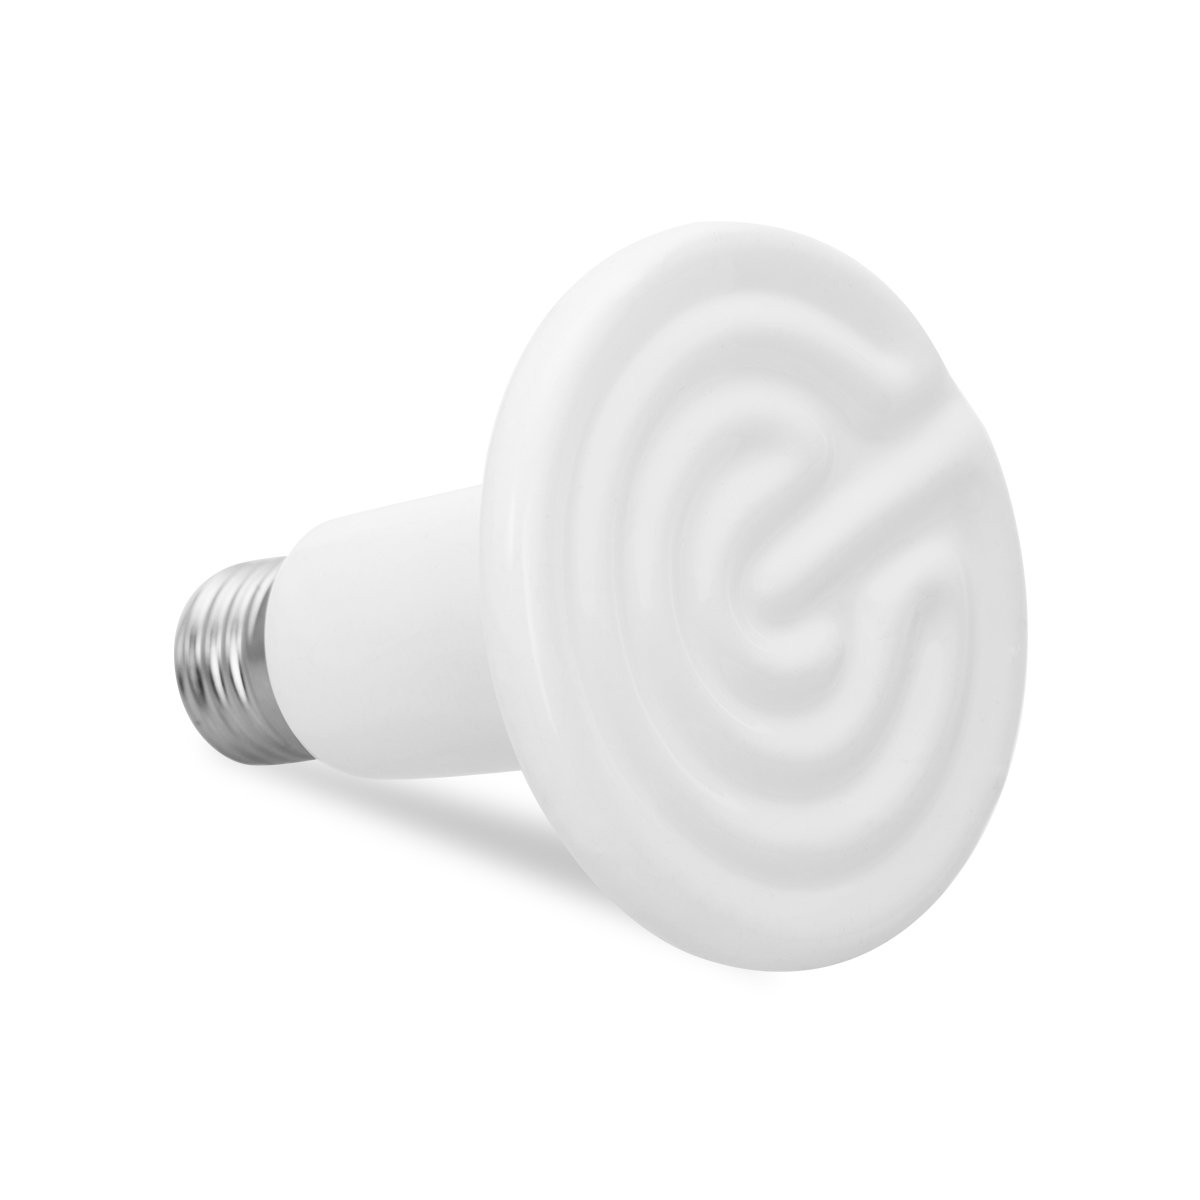 JandCase 100W Ceramic Heat Lamp, Infrared Heat Emitter Bulb, Pet Coop Heater Reptile Brooder Bulb, Non-light Lamps, White